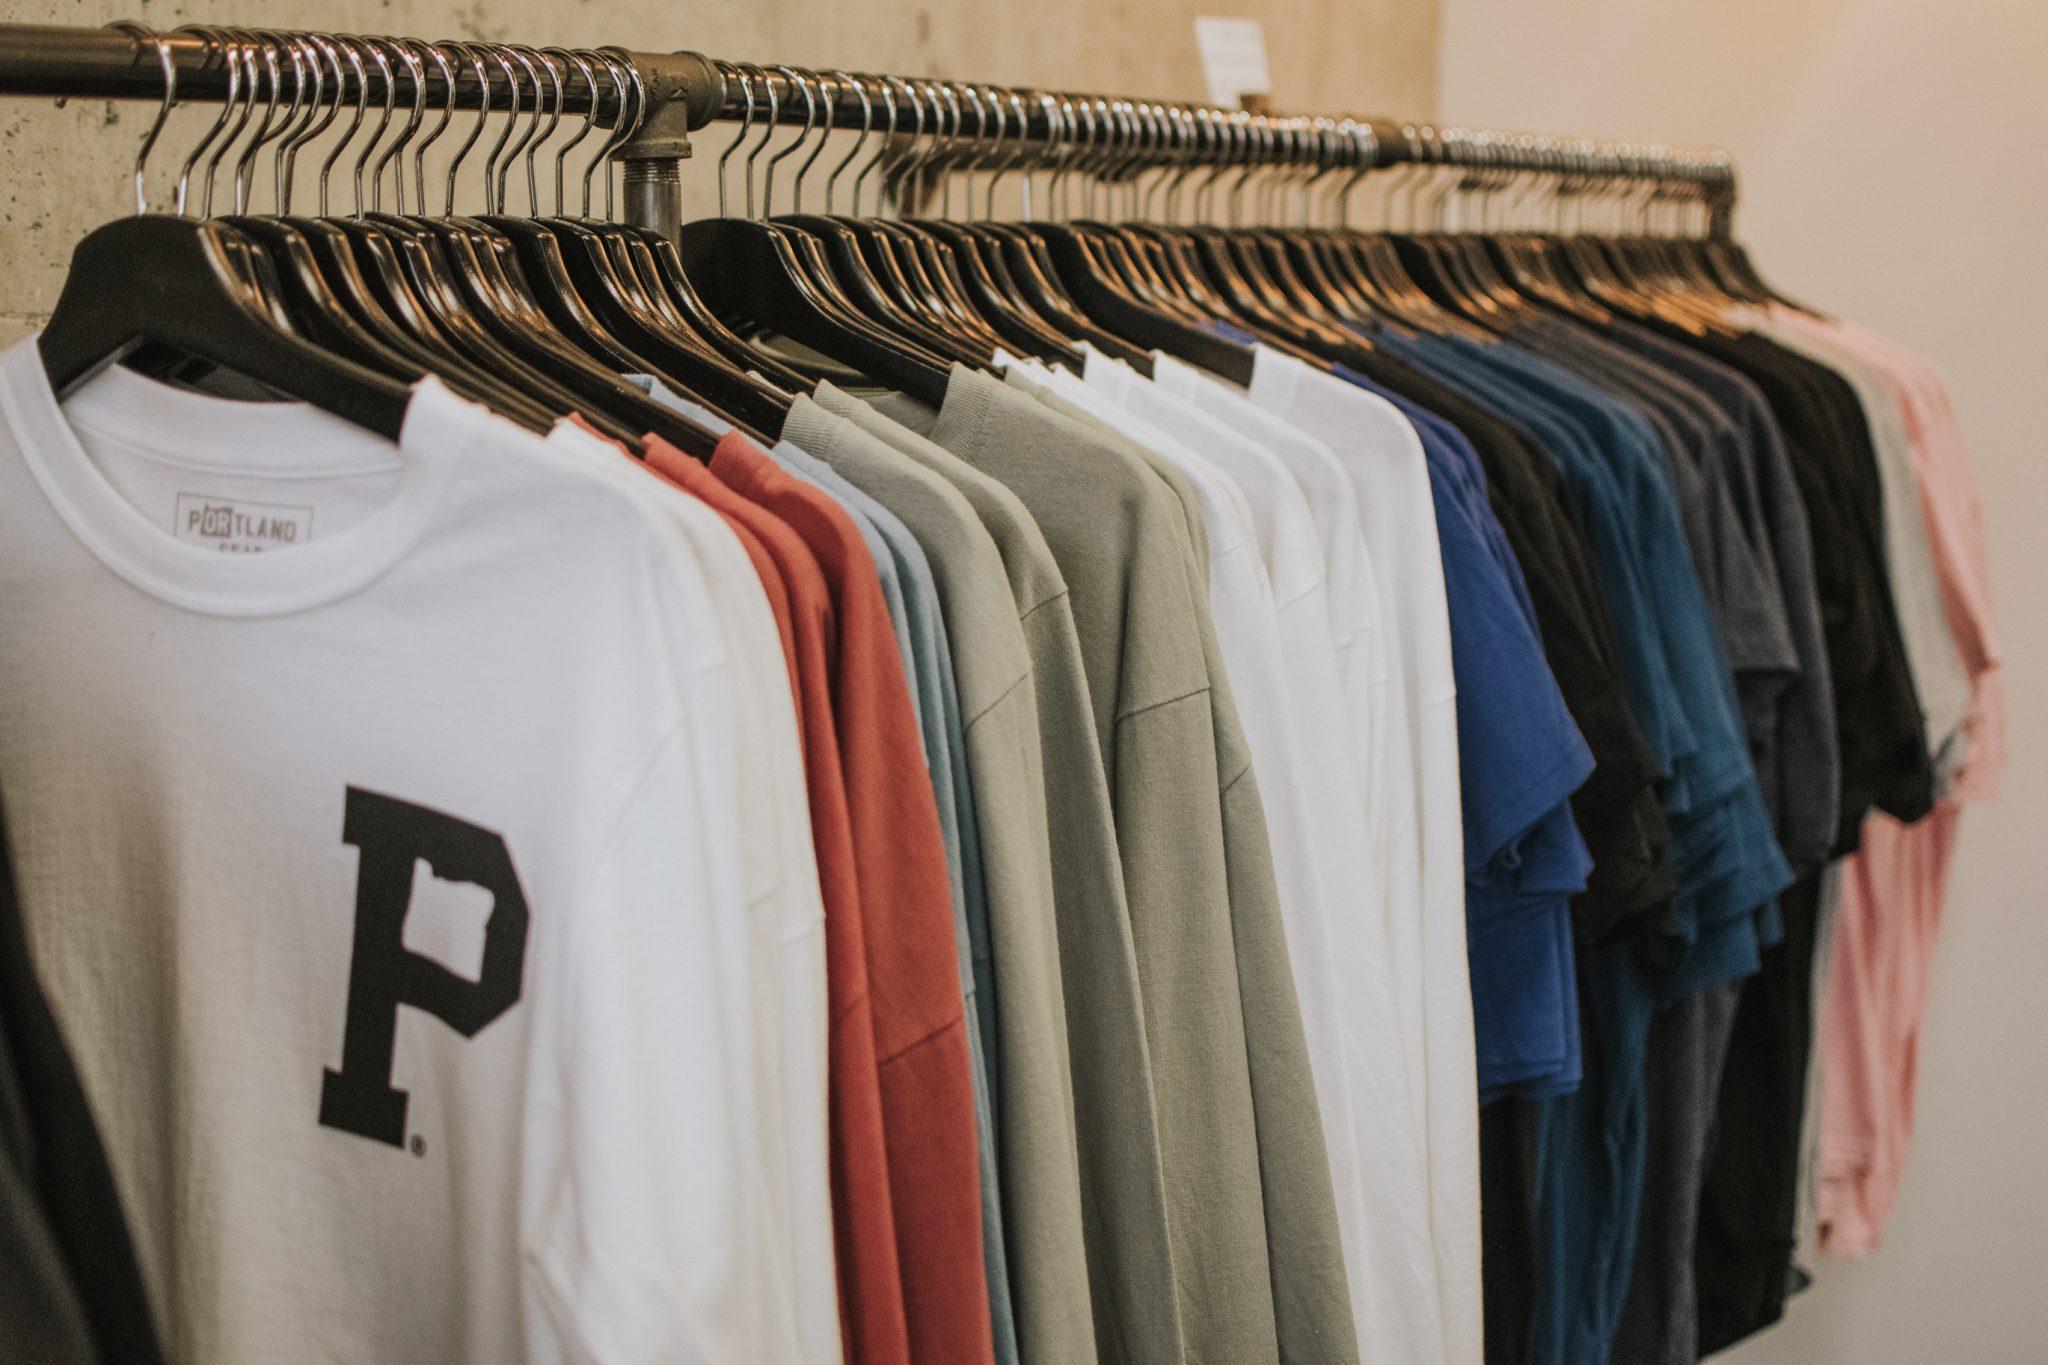 Mengenal Jenis Sablon untuk Kaos yang Bagus